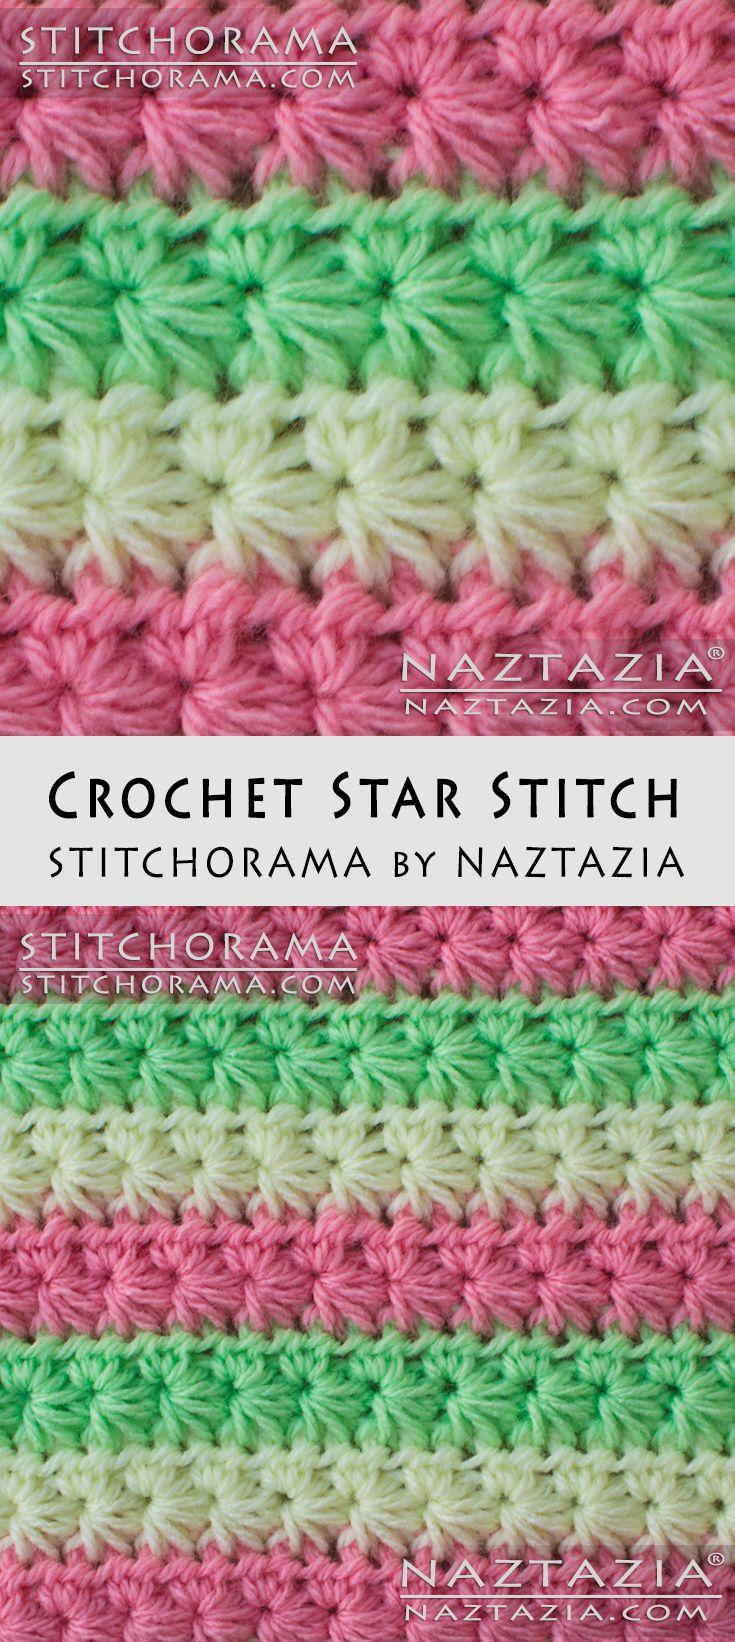 Crochet Star Stitch Stitchorama By Naztazia Free Pattern Diy